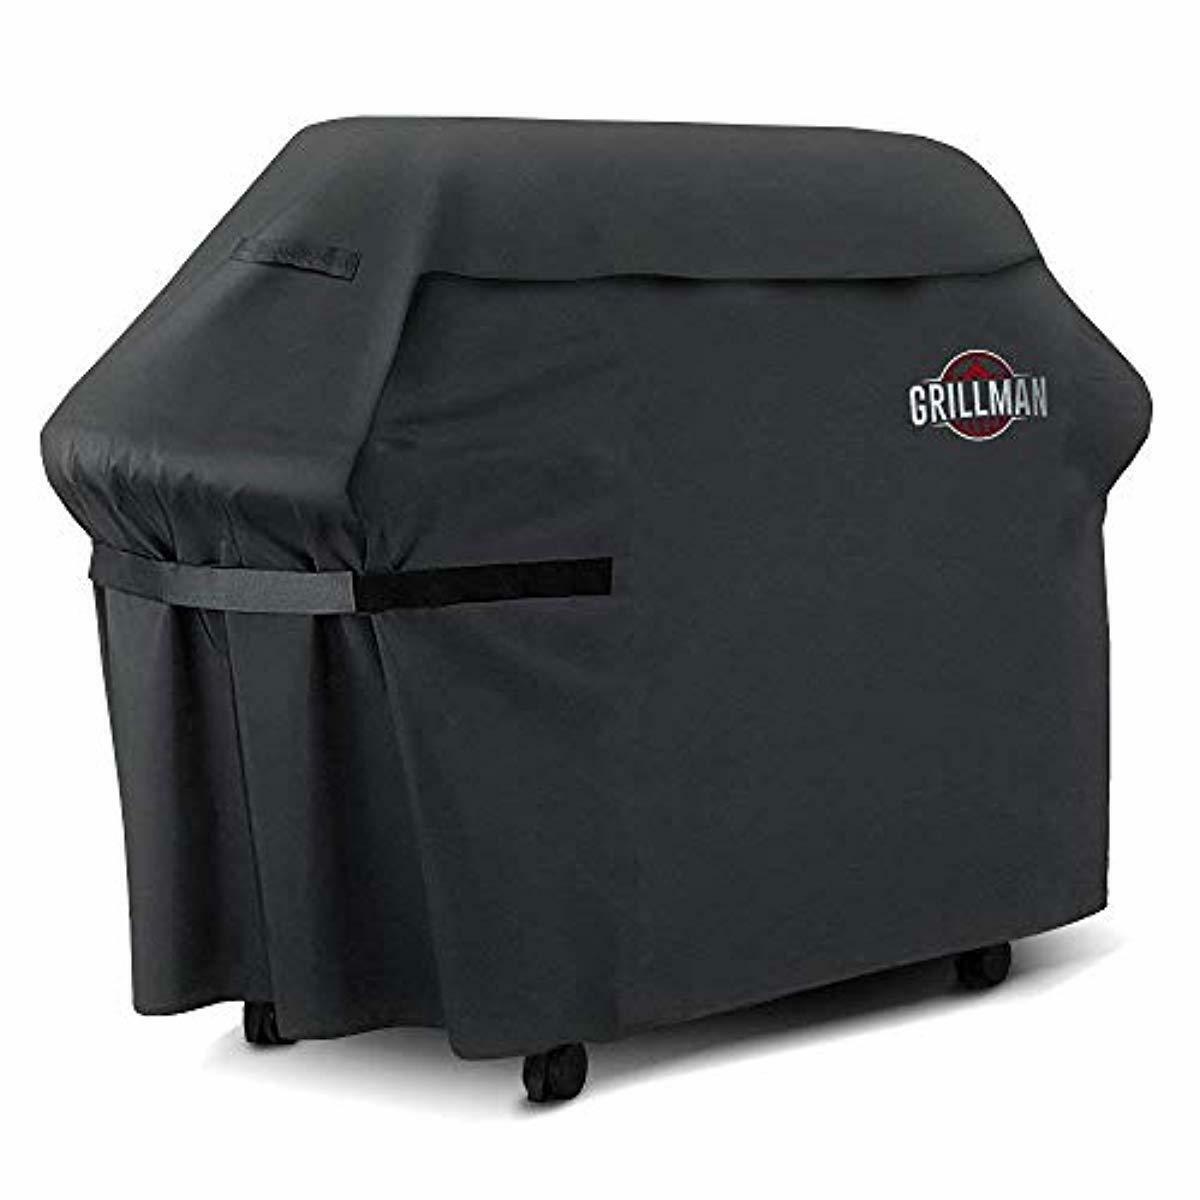 Grillman Premium BBQ Grill cubierta, Resistente Gas Parrilla Cubierta Para Weber, Brinkman